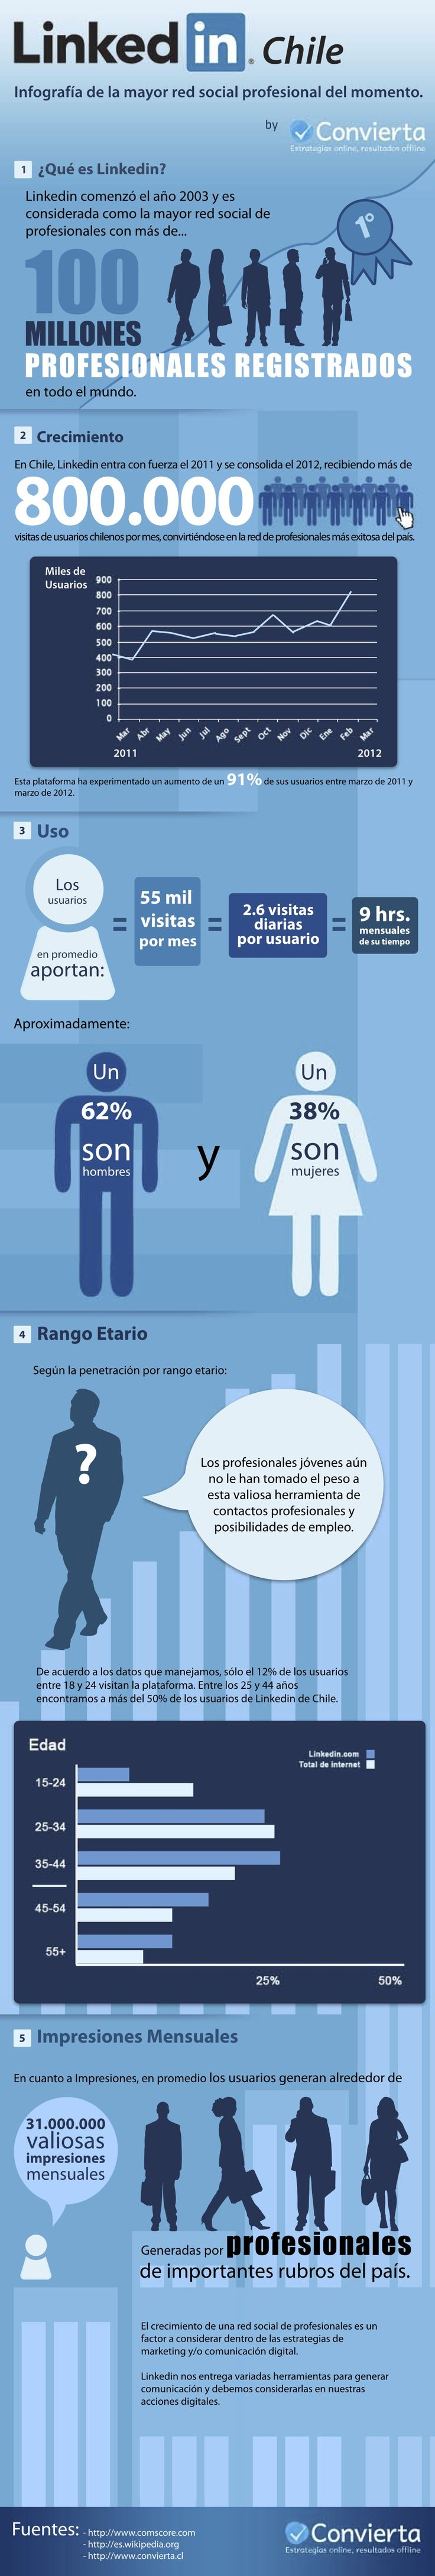 Linkedin en Chile #infografia #infographic